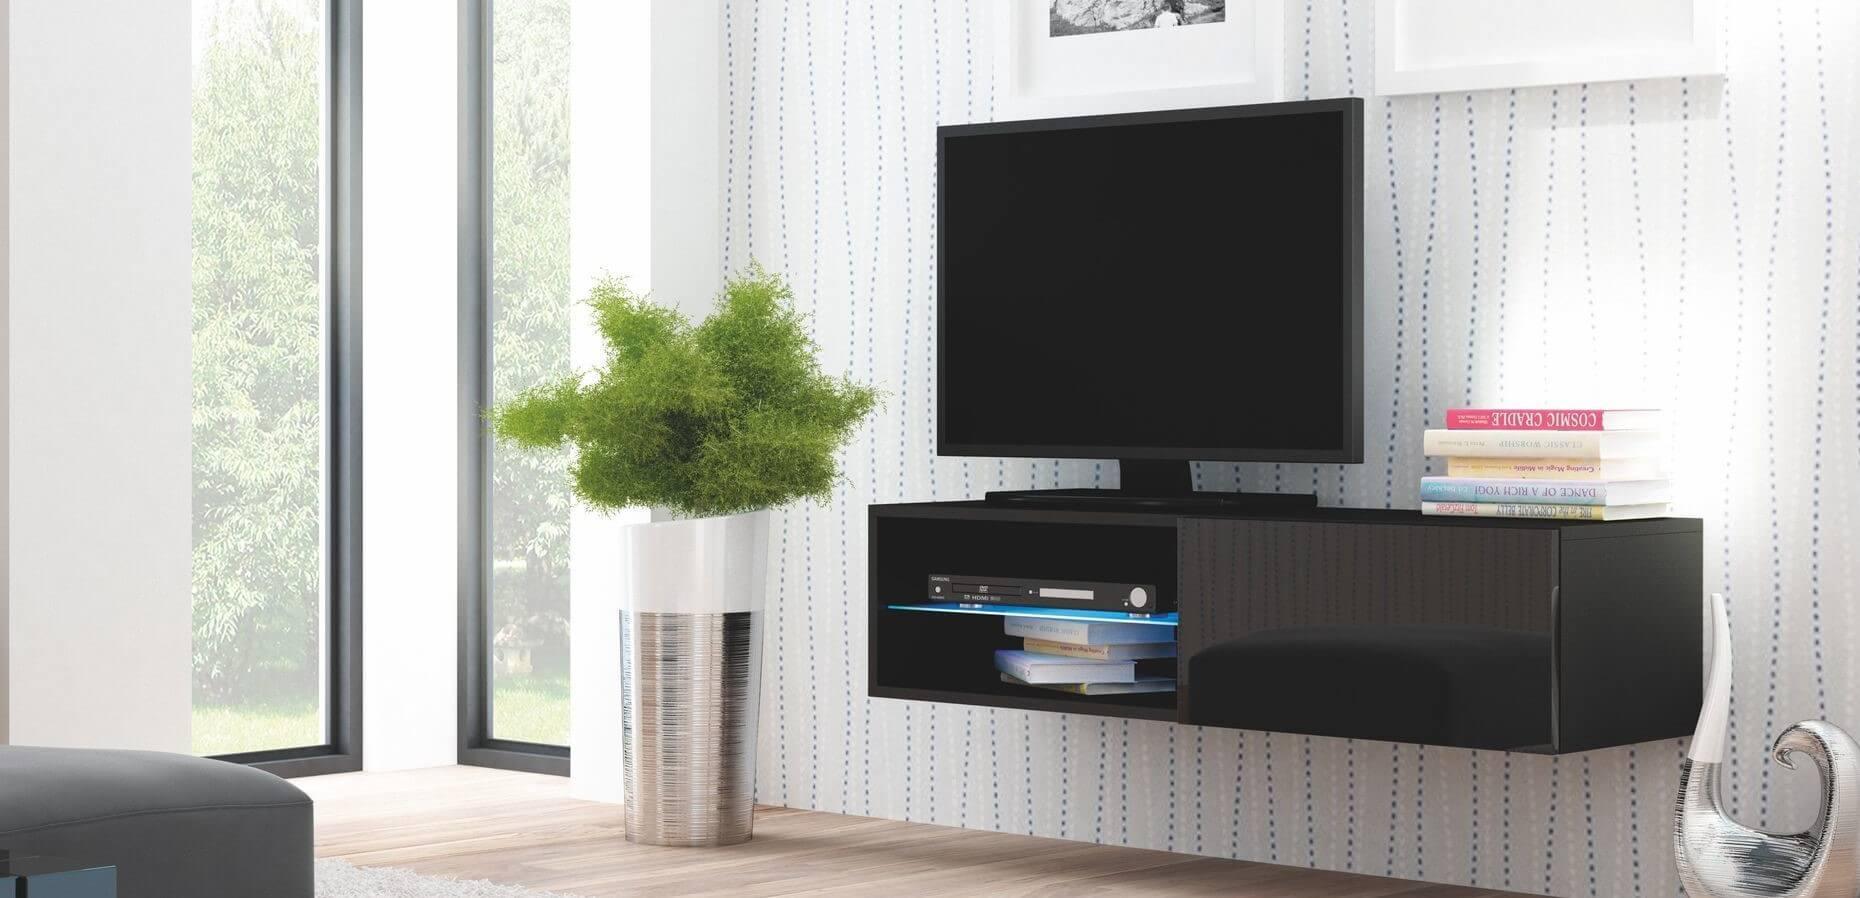 podvesnaya-tumba-pod-televizor (1)